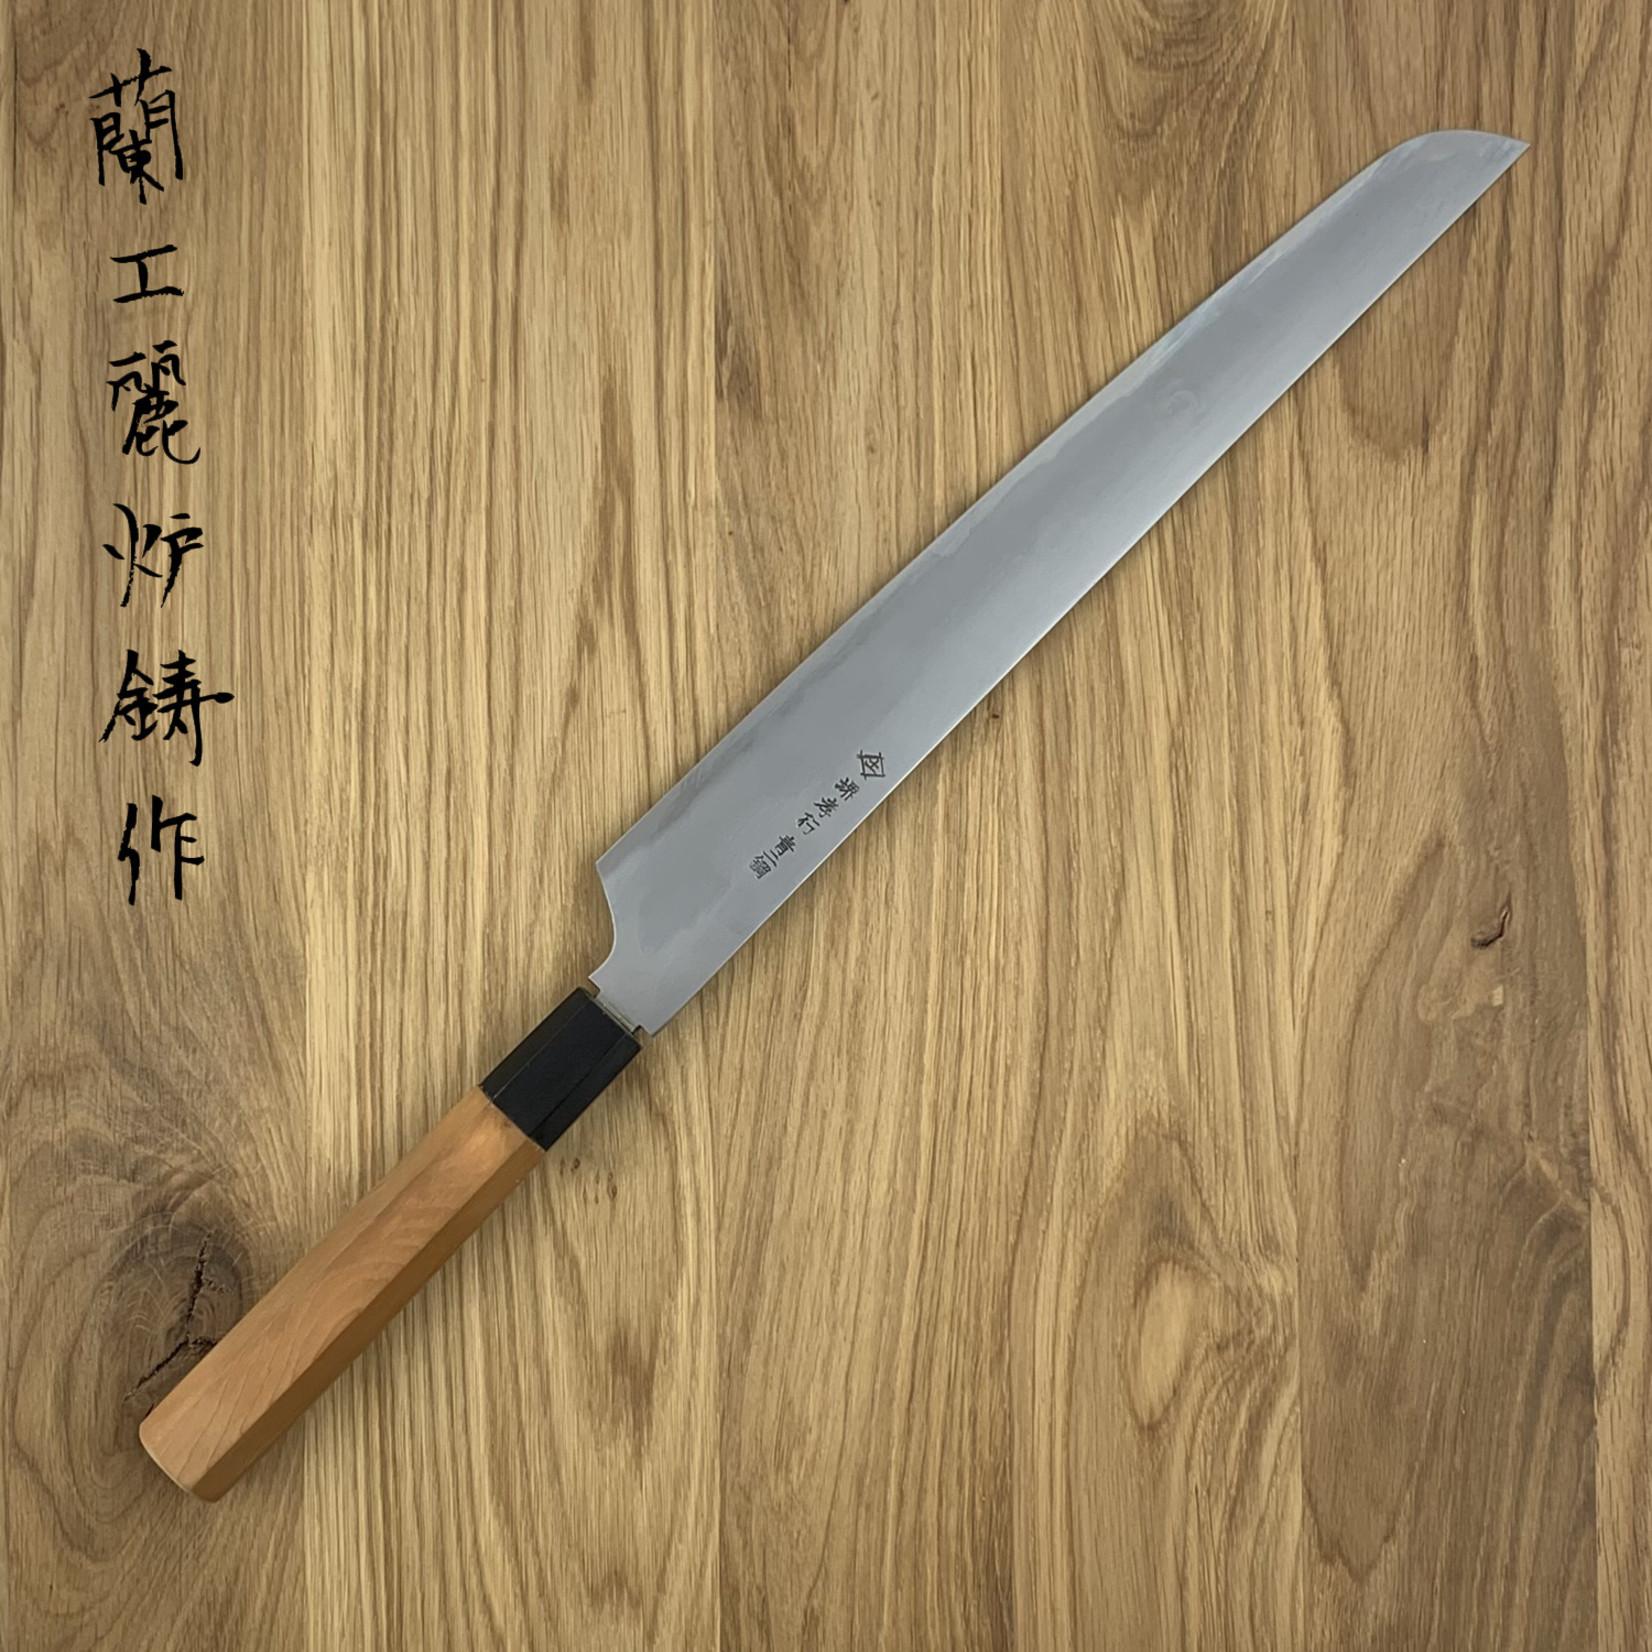 SAKAI TAKAYUKI Homura Blue #2 sakimaru 300 mm 02259